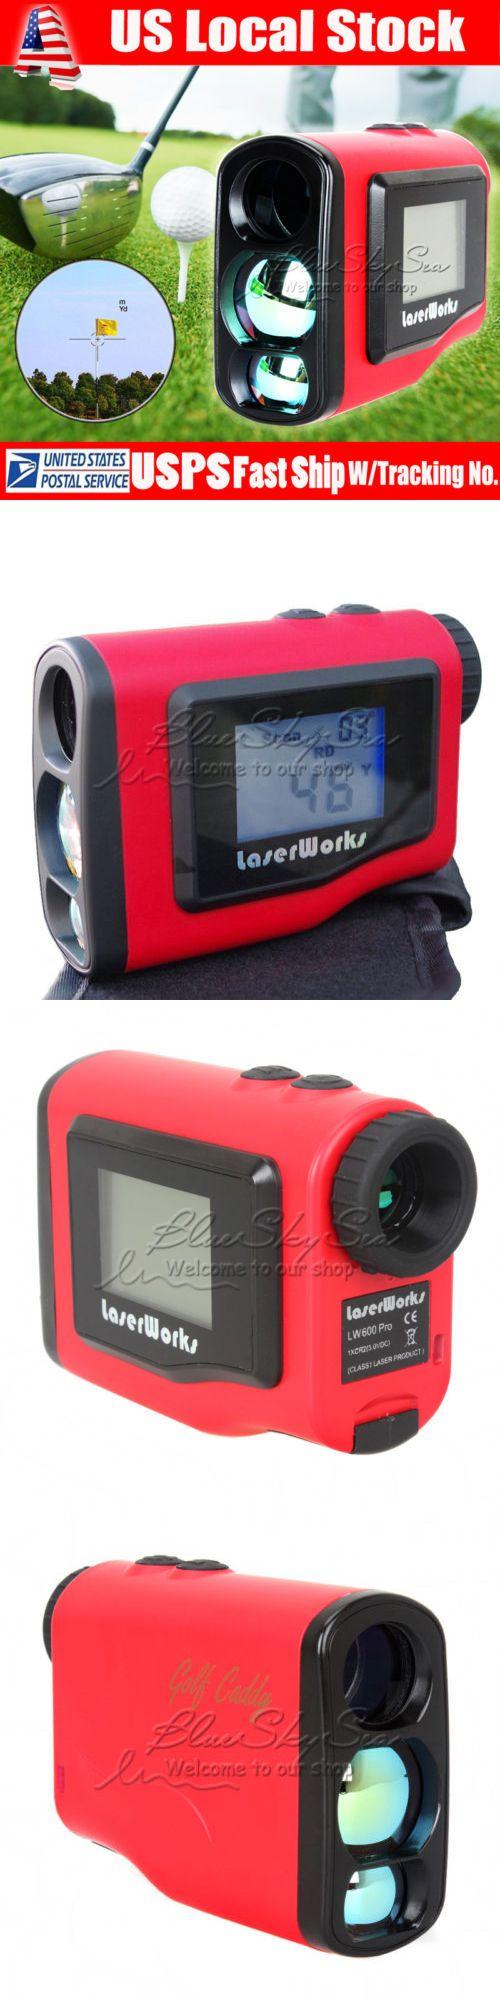 Range Finders 31712: 600 Meter Laser Golf Range Finder 6Xzoom Lcd Screen For Golf Hunting Measurement BUY IT NOW ONLY: $104.55